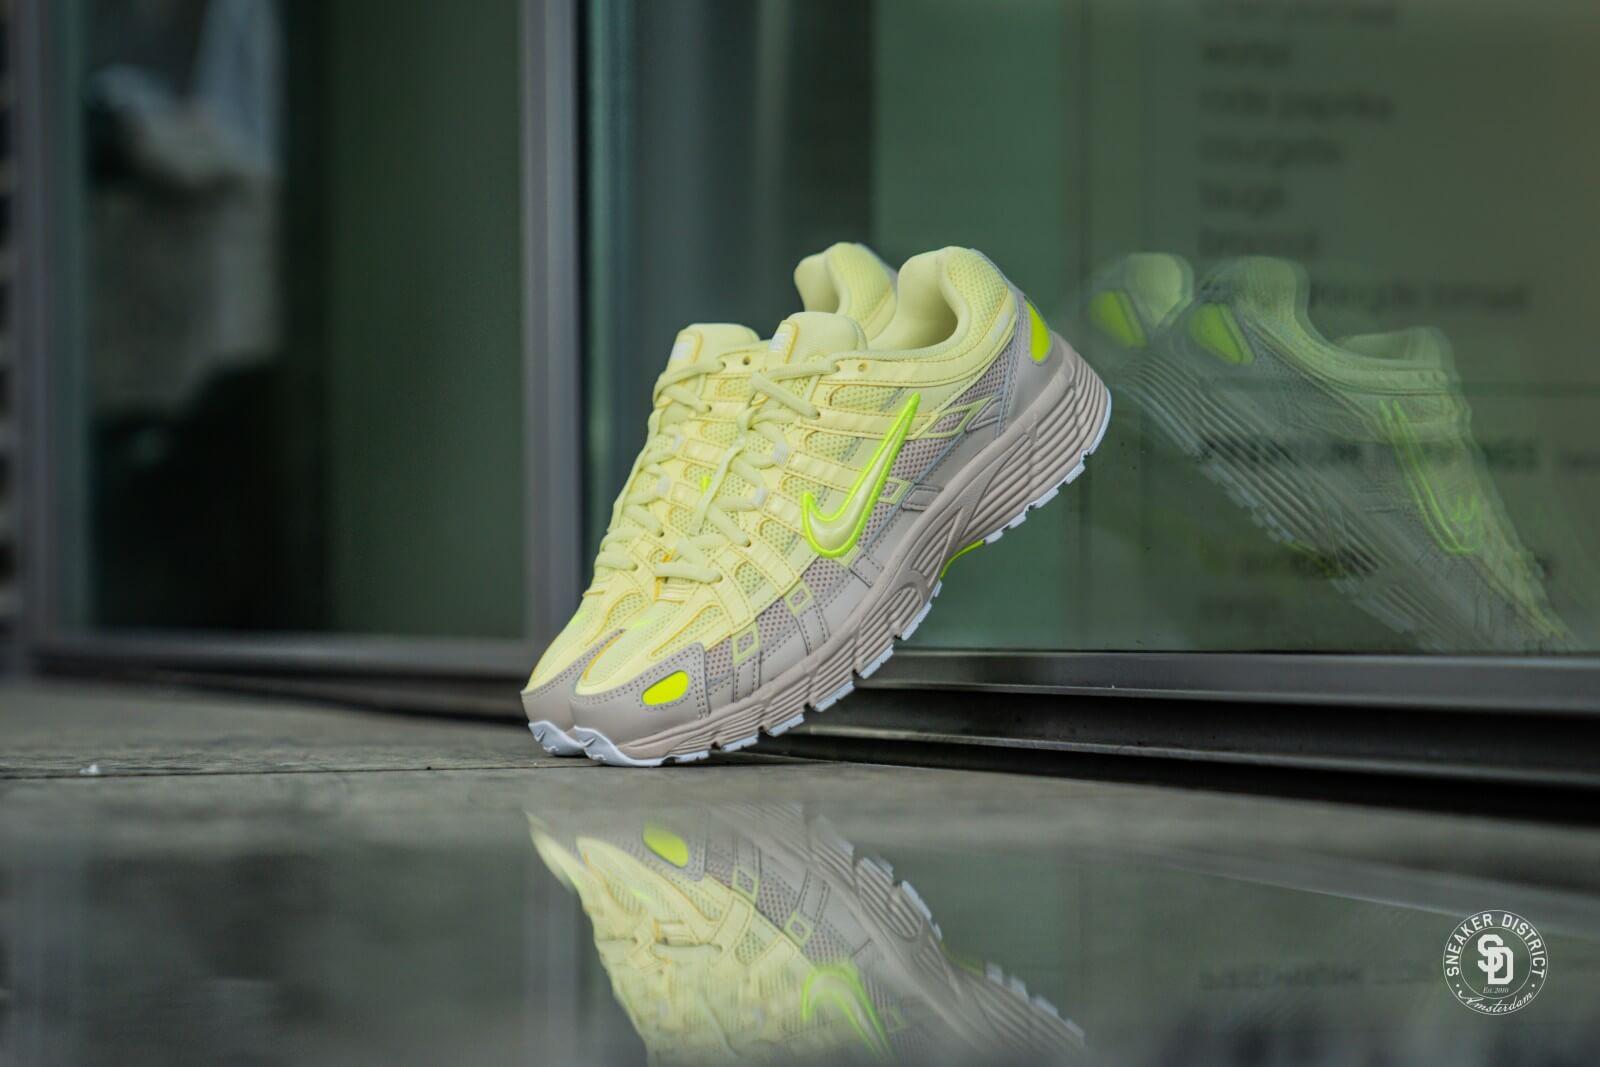 Nike Women's Shoes Sears